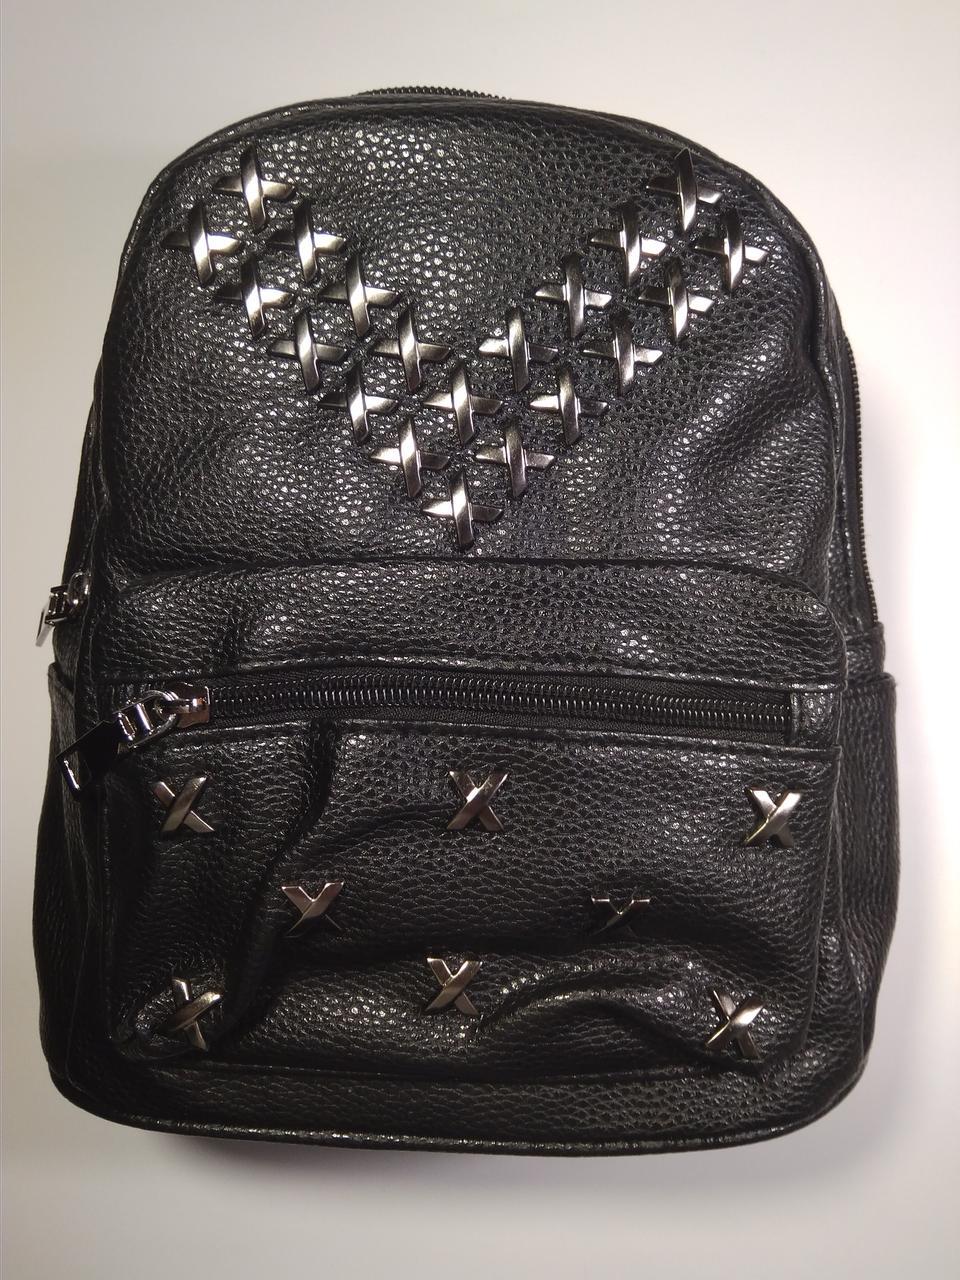 00e0834e9dbf ... Рюкзаки городские и спортивные; Рюкзак женский черный. Рюкзак женский  черный